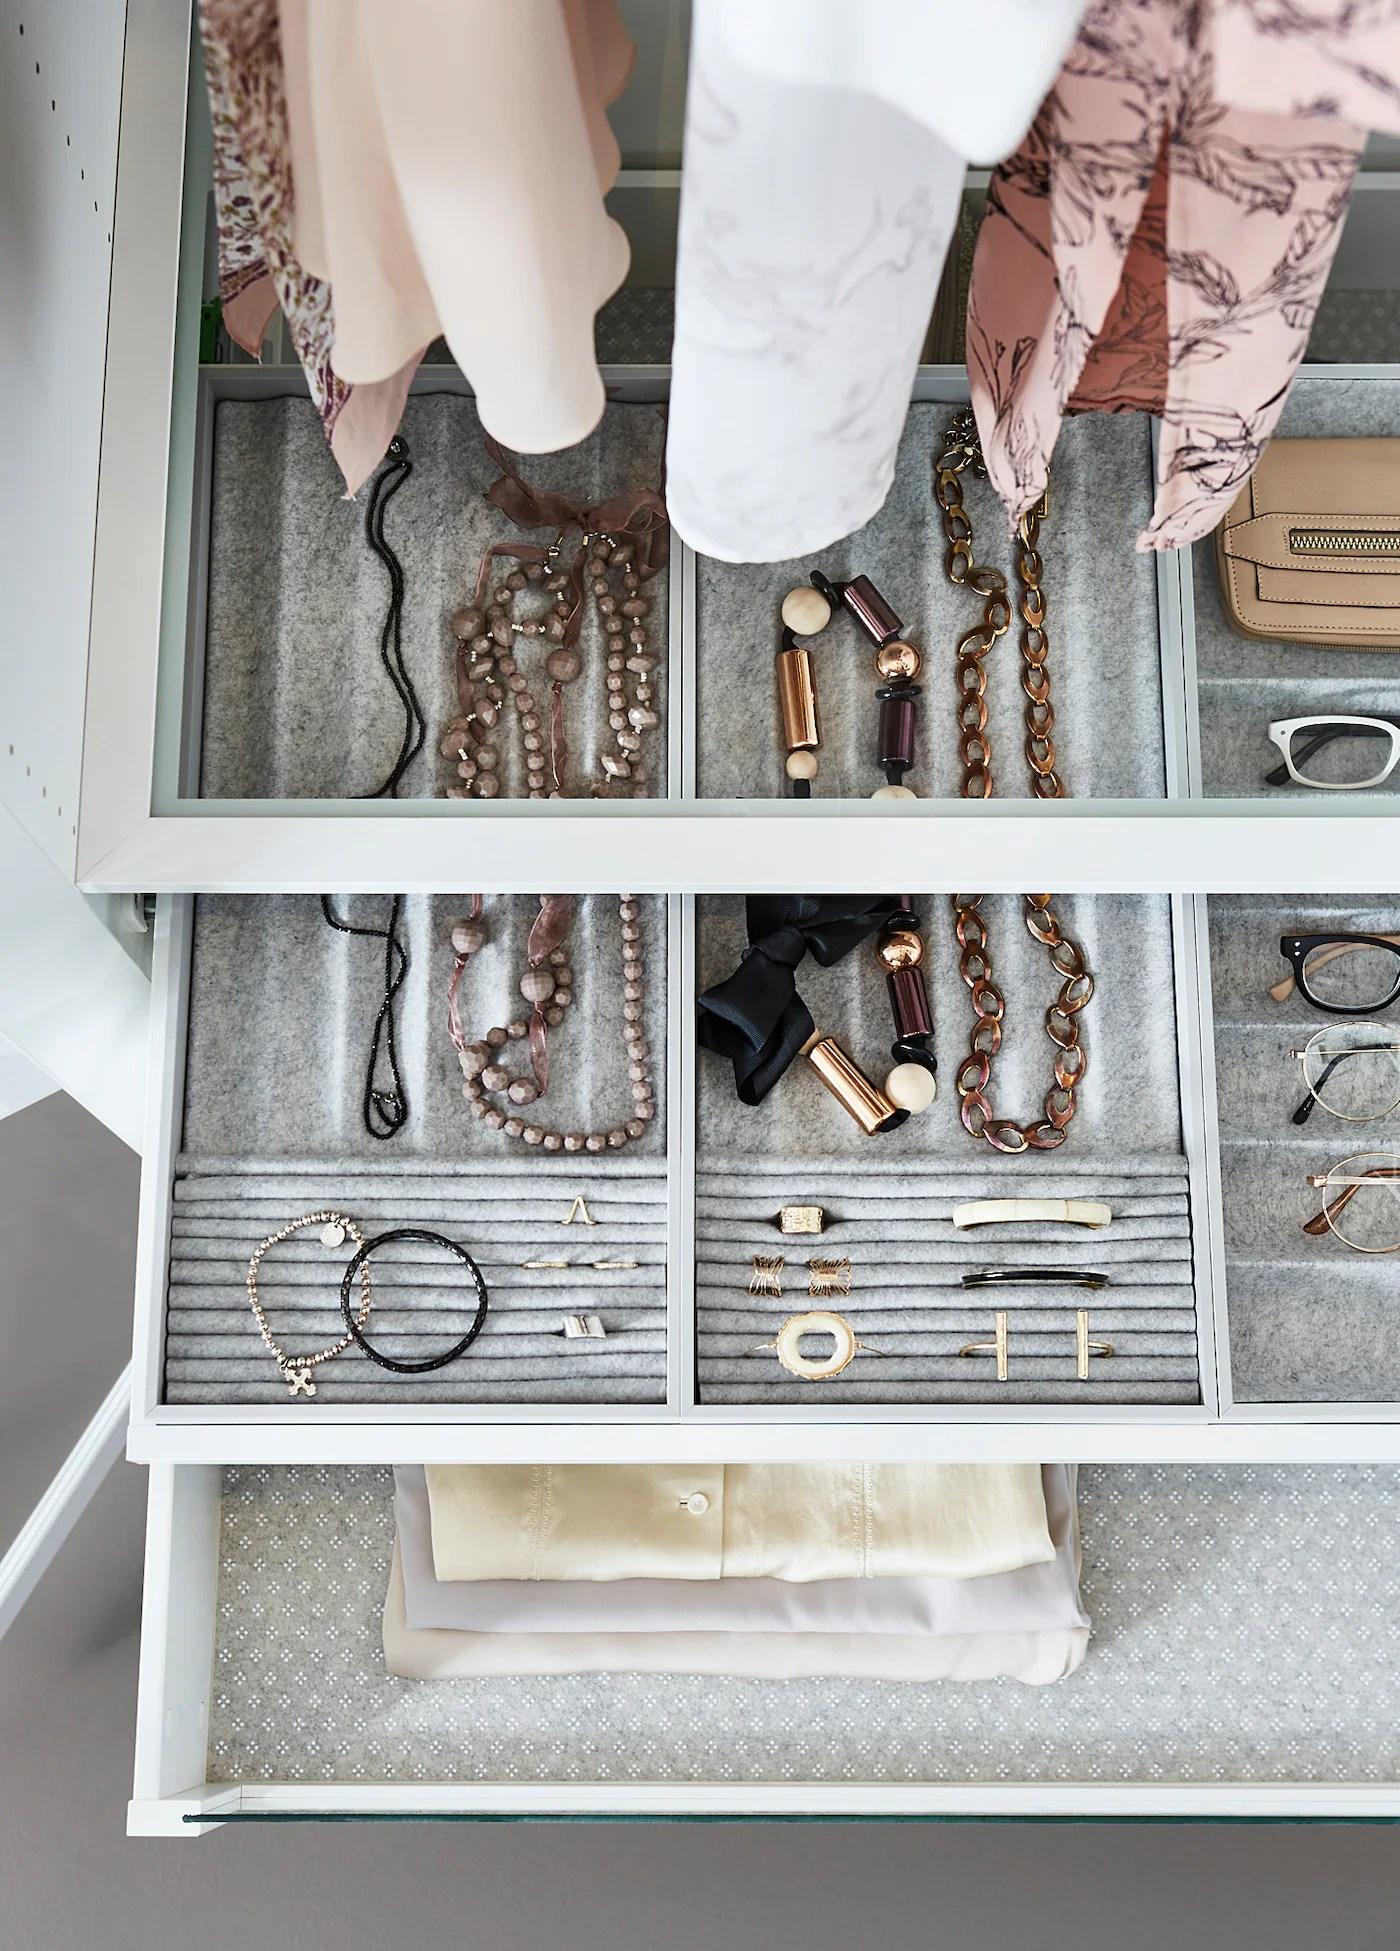 Jewellery Organizer Ikea : jewellery, organizer, KOMPLEMENT, Insert, Pull-out, Tray,, Light, Gray,, 3/8x22, 7/8